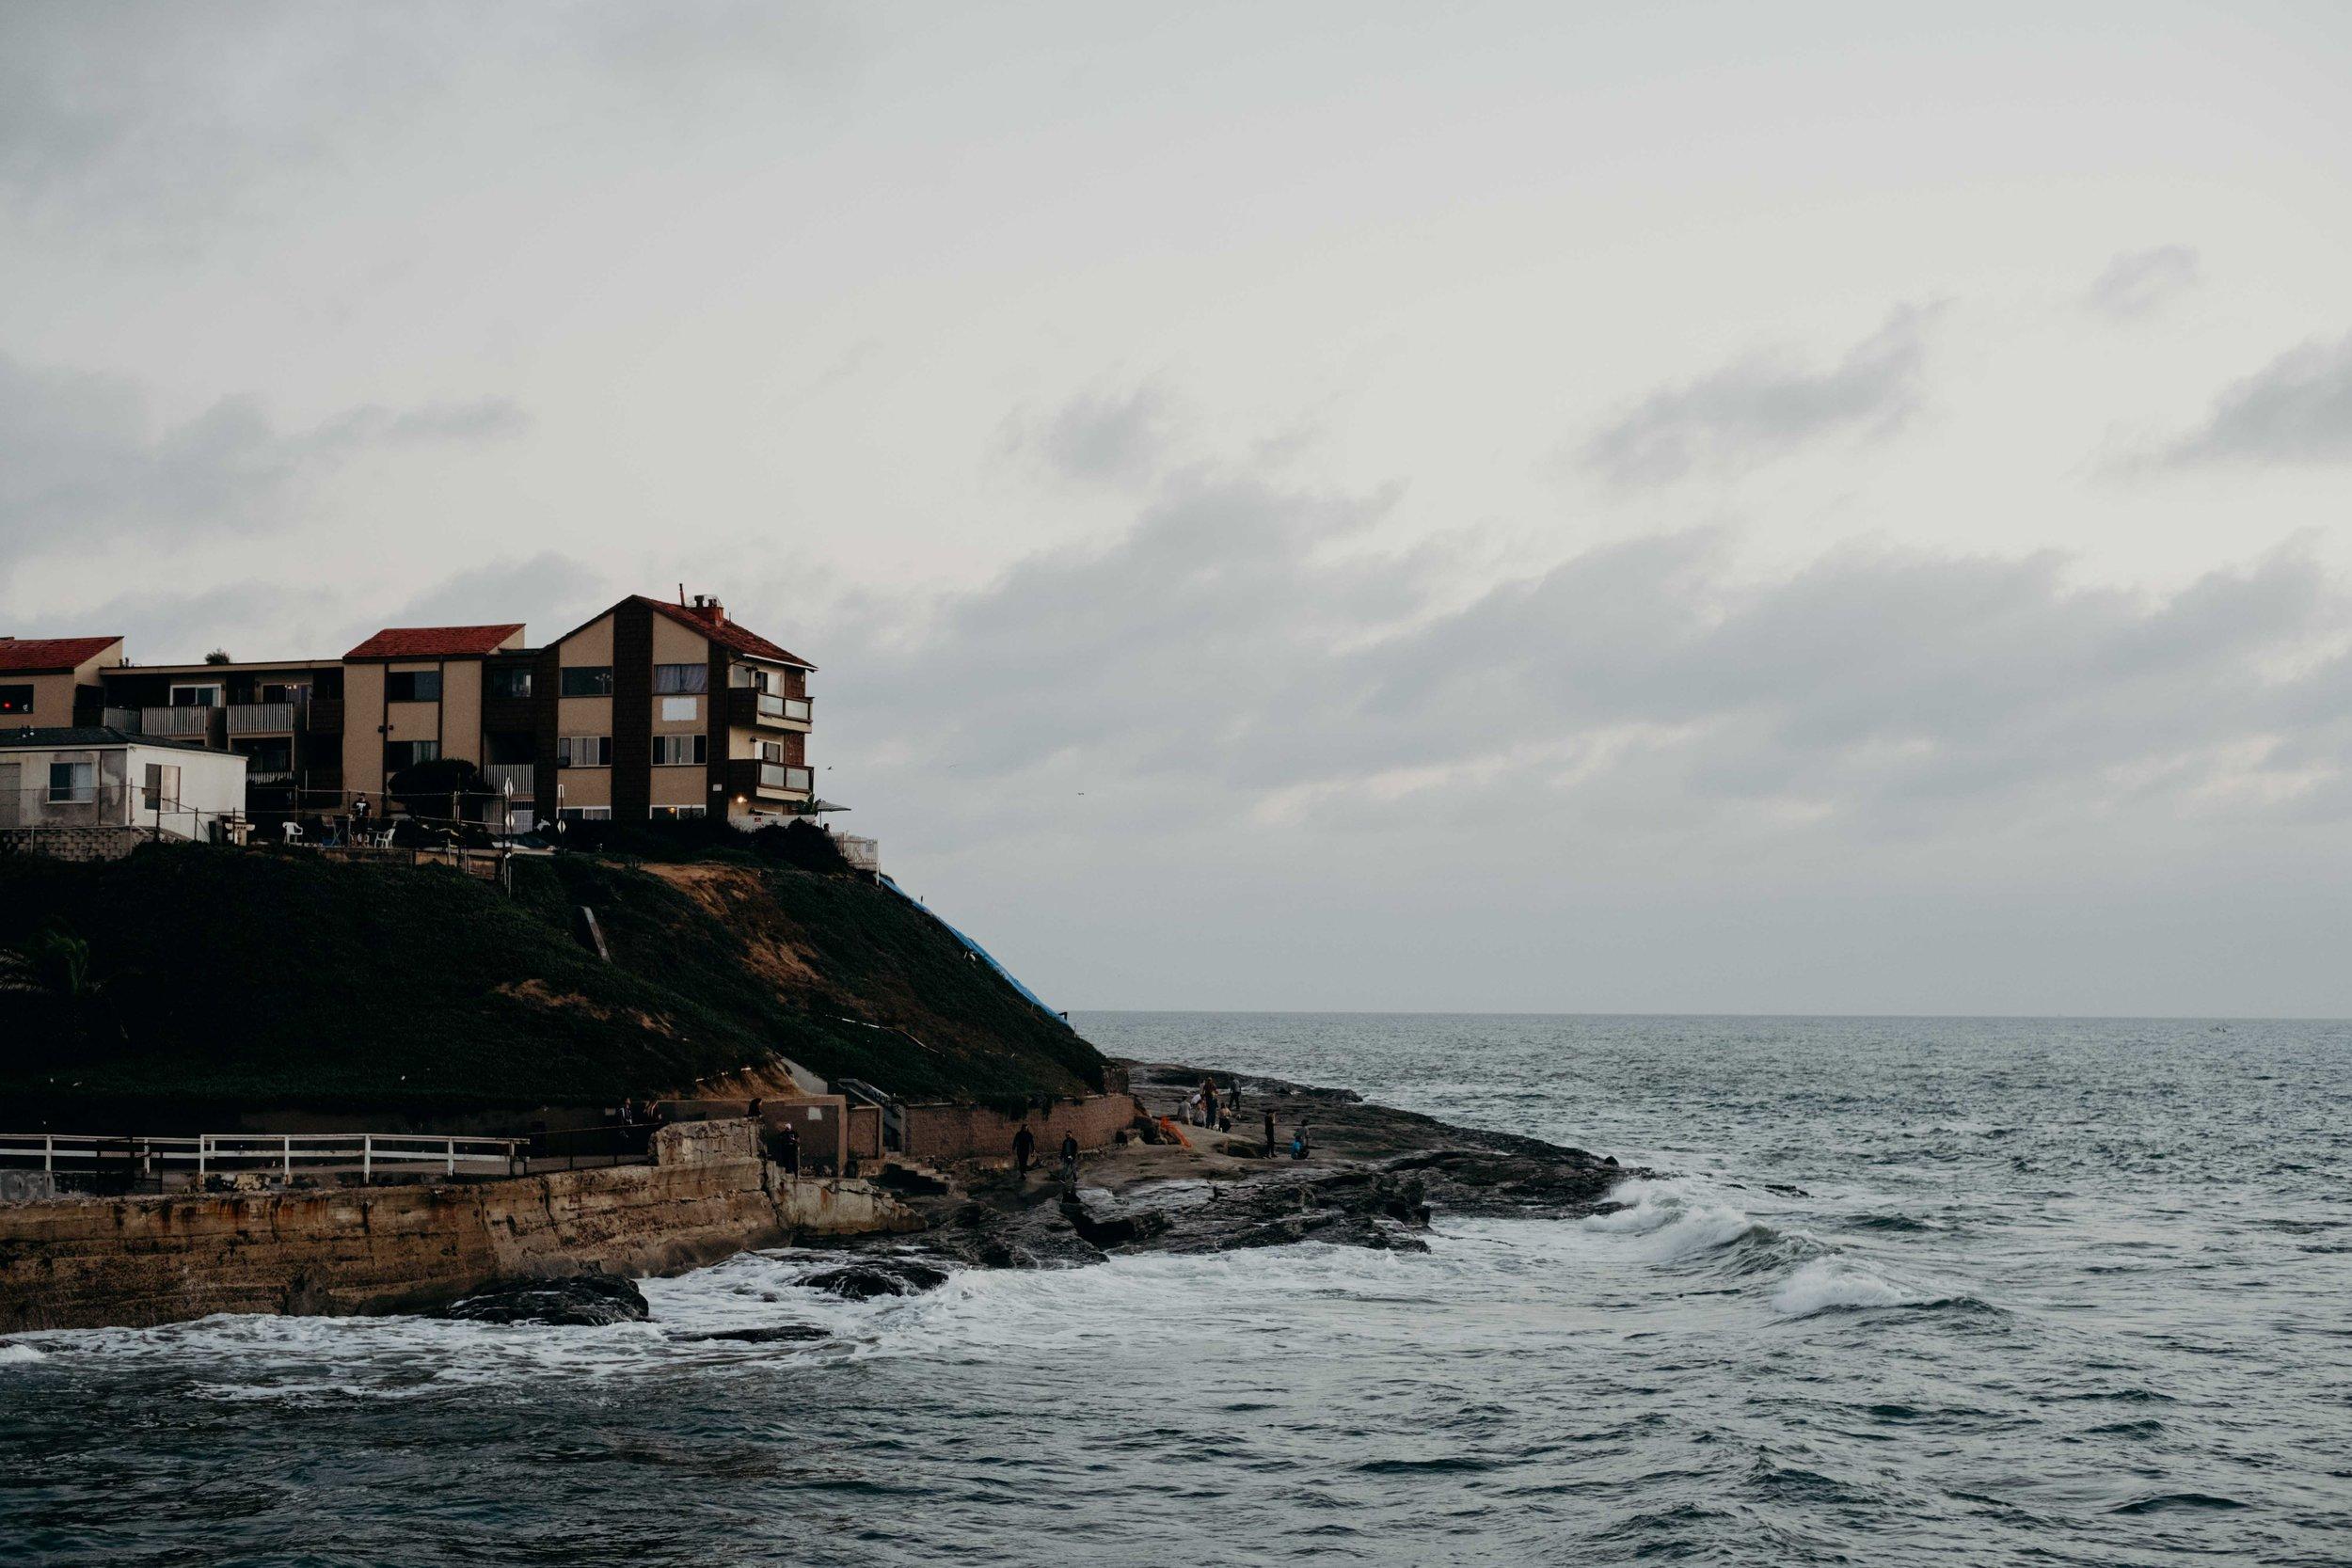 20171003_San Diego Travel Guide_33.jpg